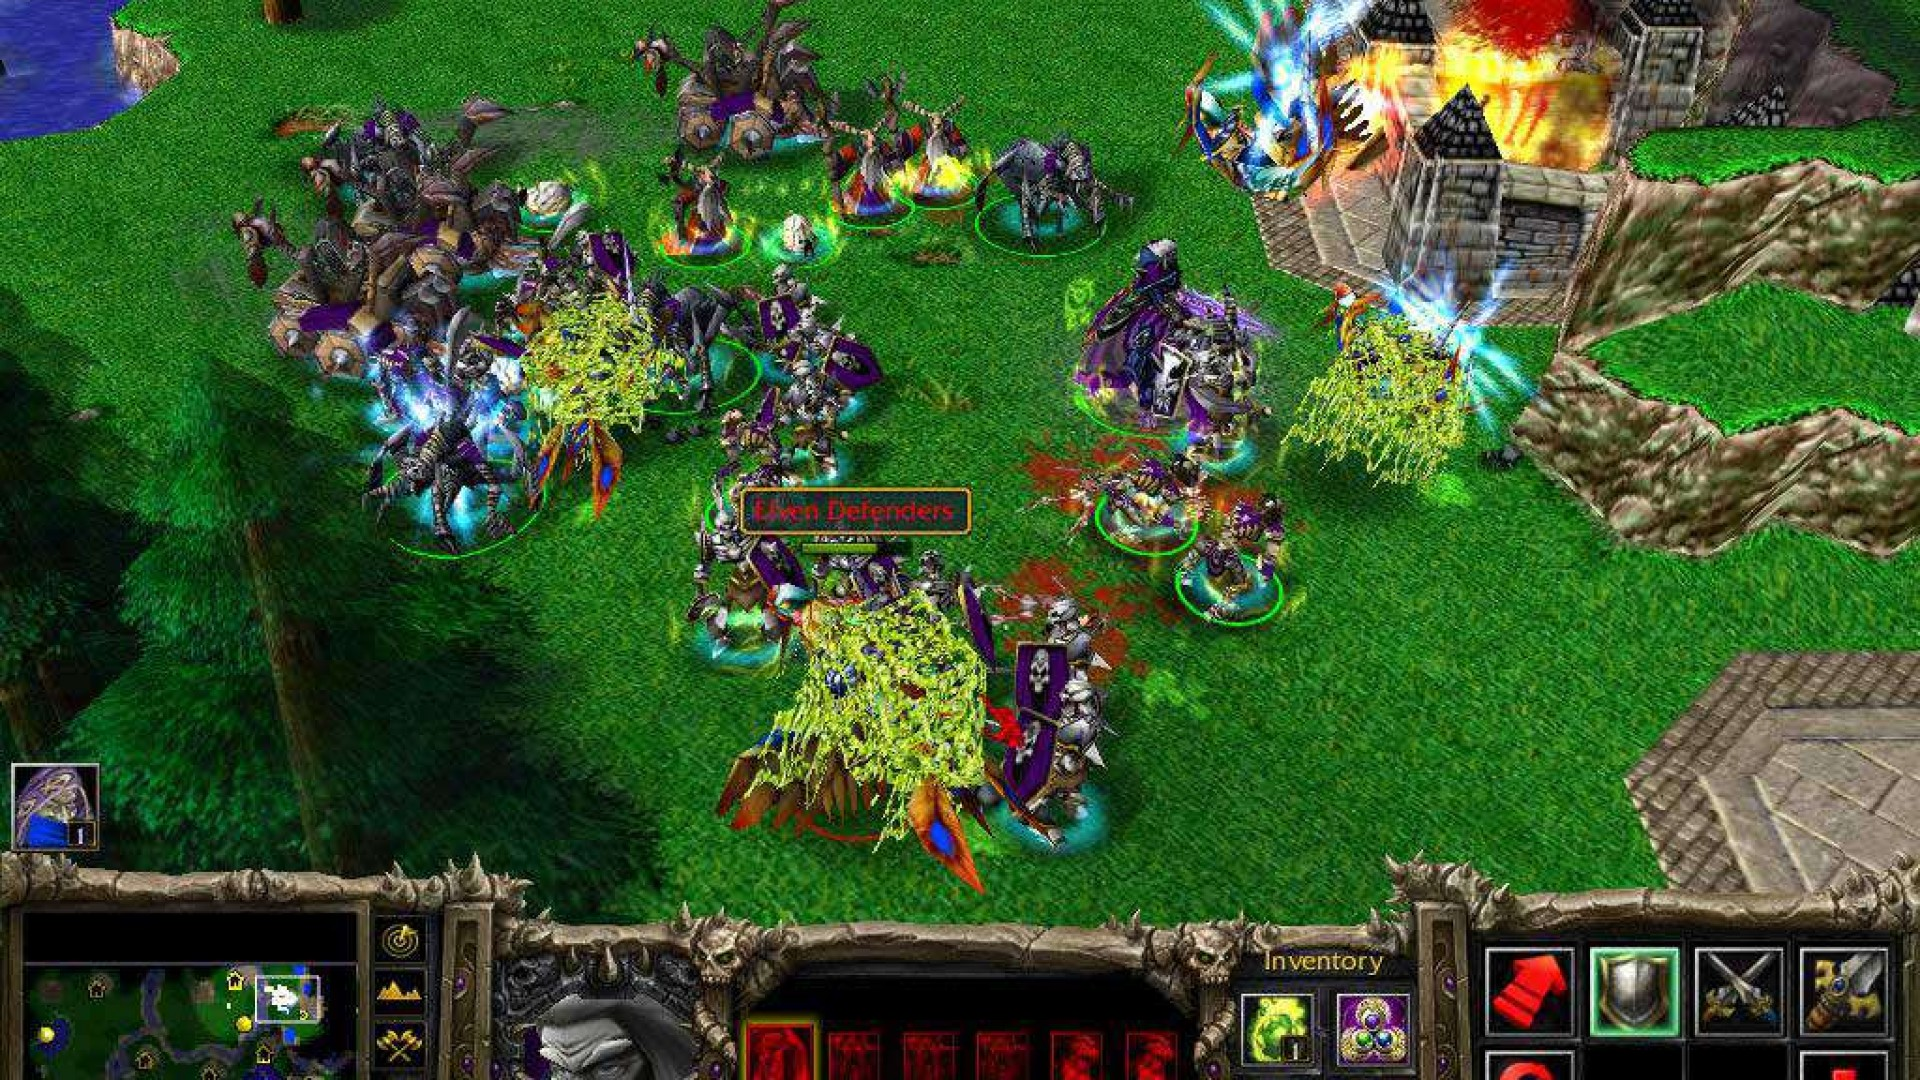 Warcraft iii chaos orc map fucked amateurs teen